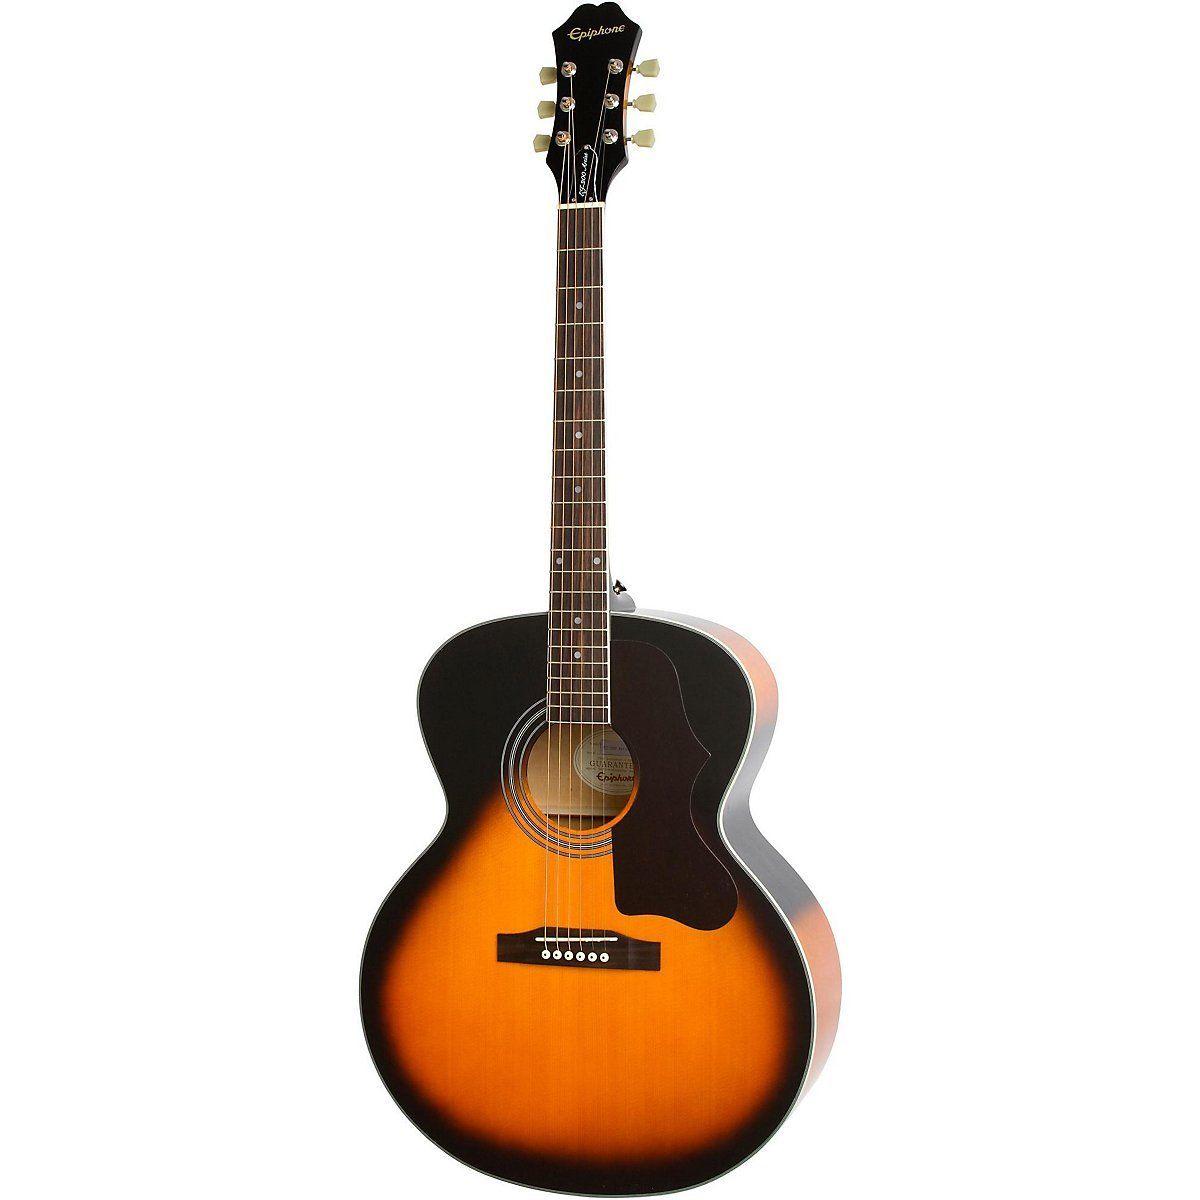 Epiphone ej 200 artist google search epiphone guitar